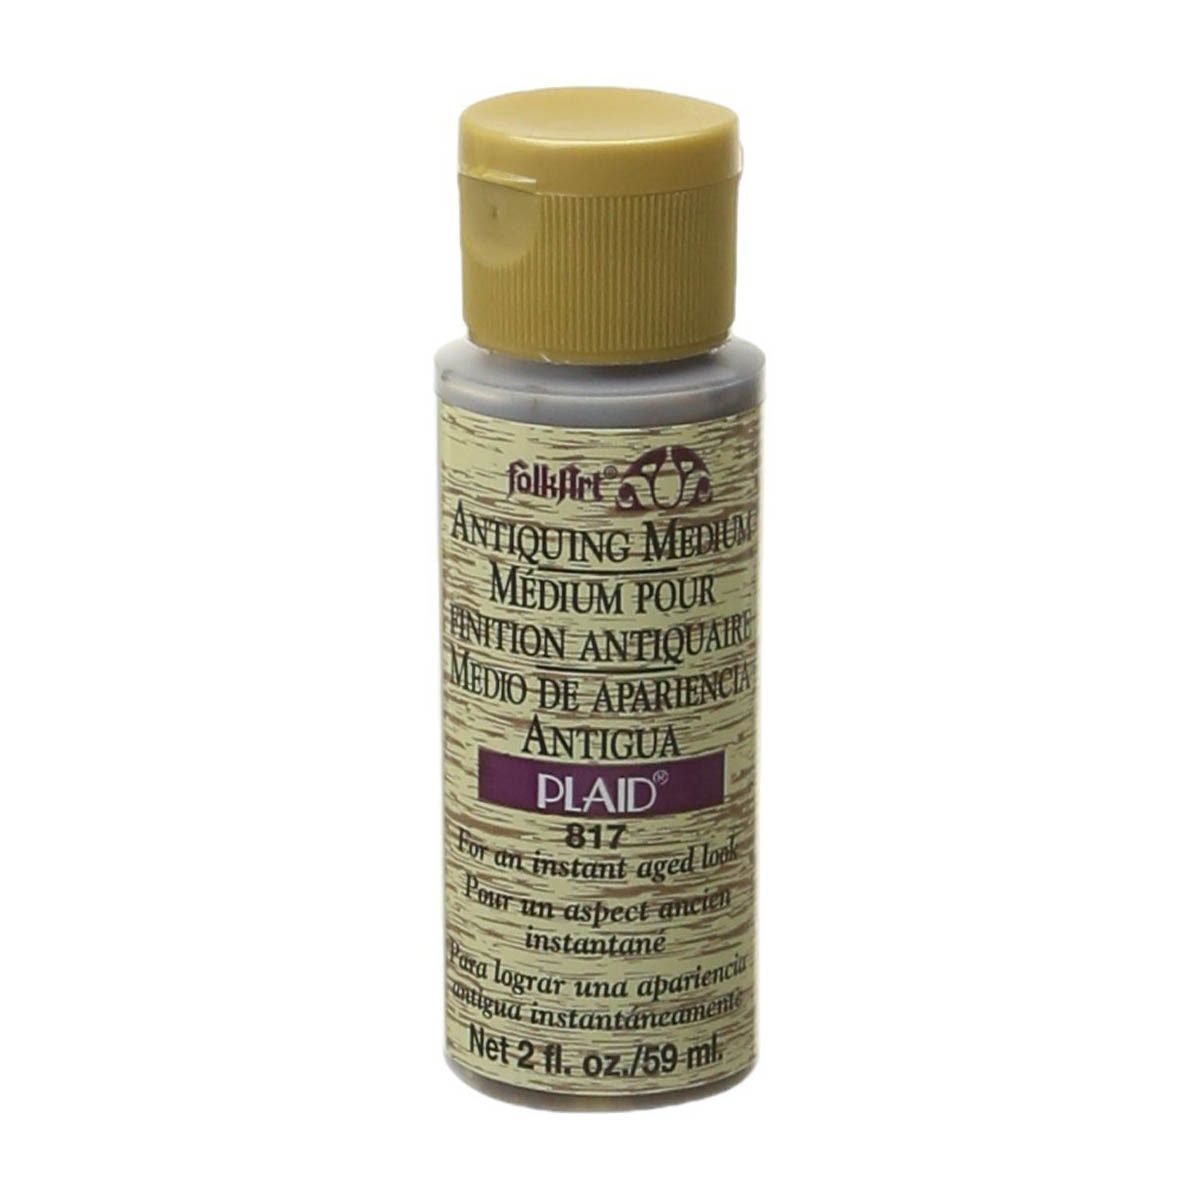 FolkArt ® Mediums - Antiquing Medium - Woodn' Bucket Brown, 2 oz.